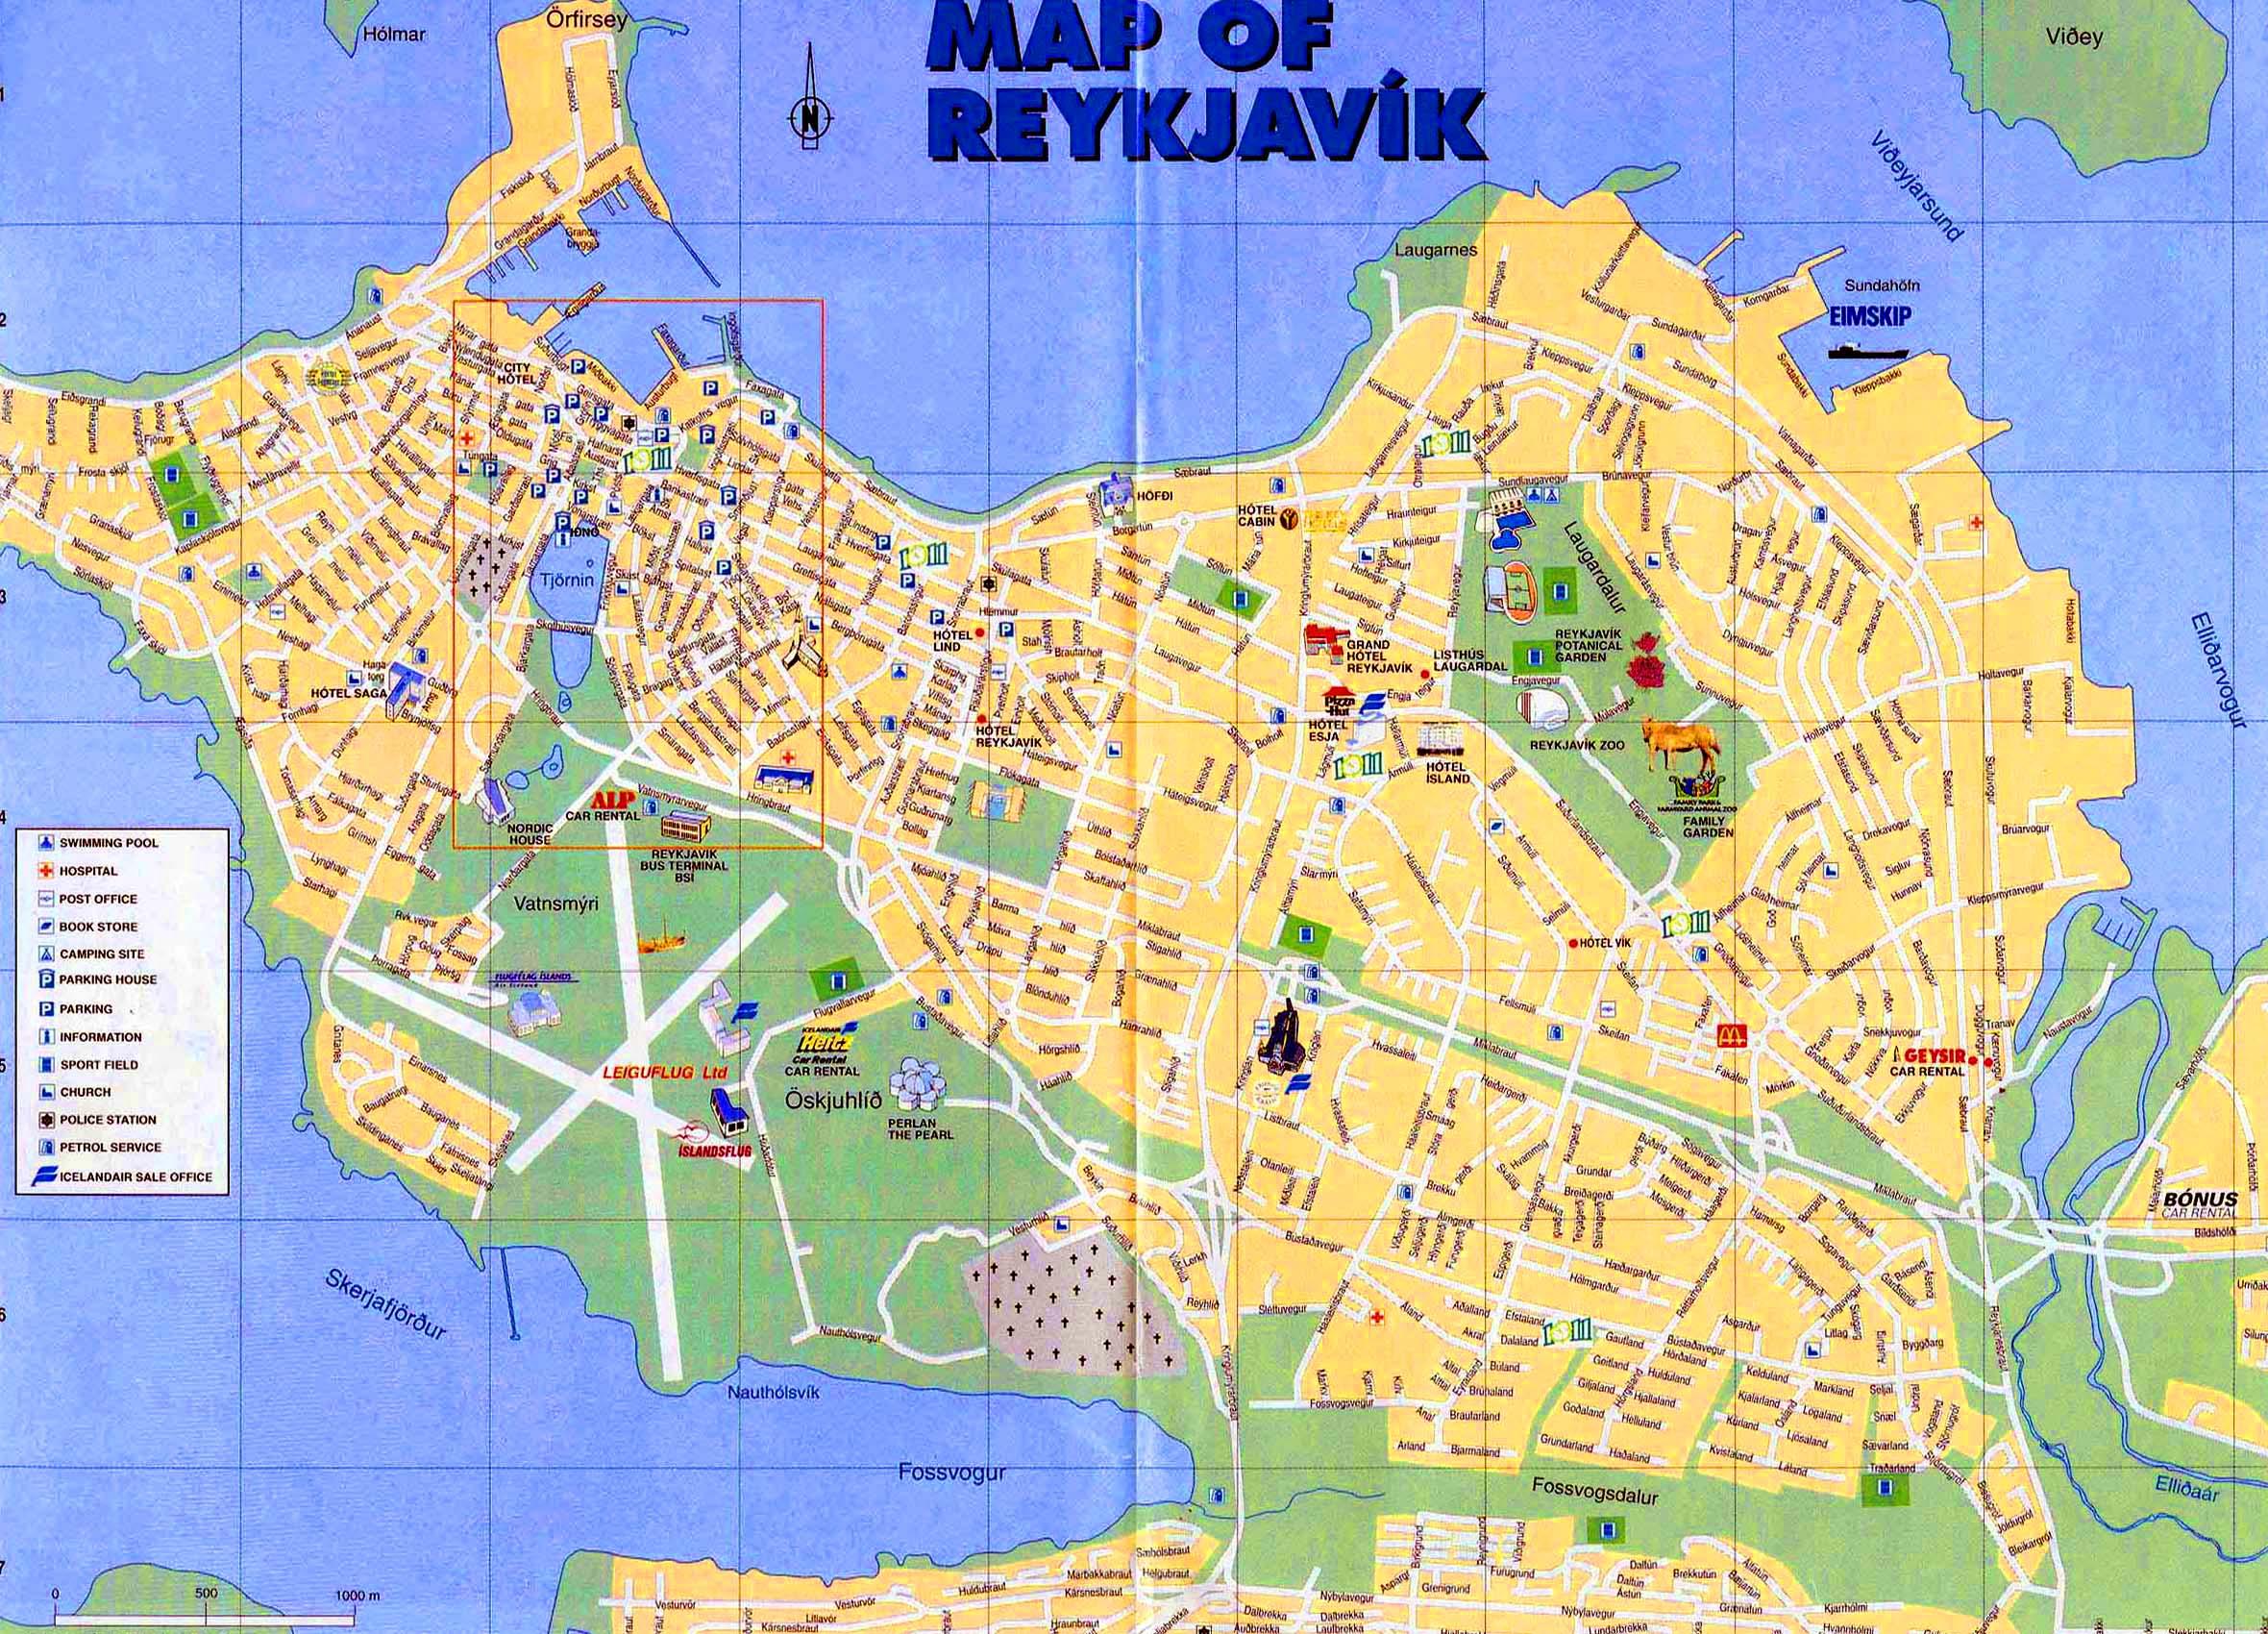 liechtenstein map with Reykjavik on Landkarte likewise Europe as well Journee Internationale De La Francophonie together with Entity 5708 further Reykjavik.